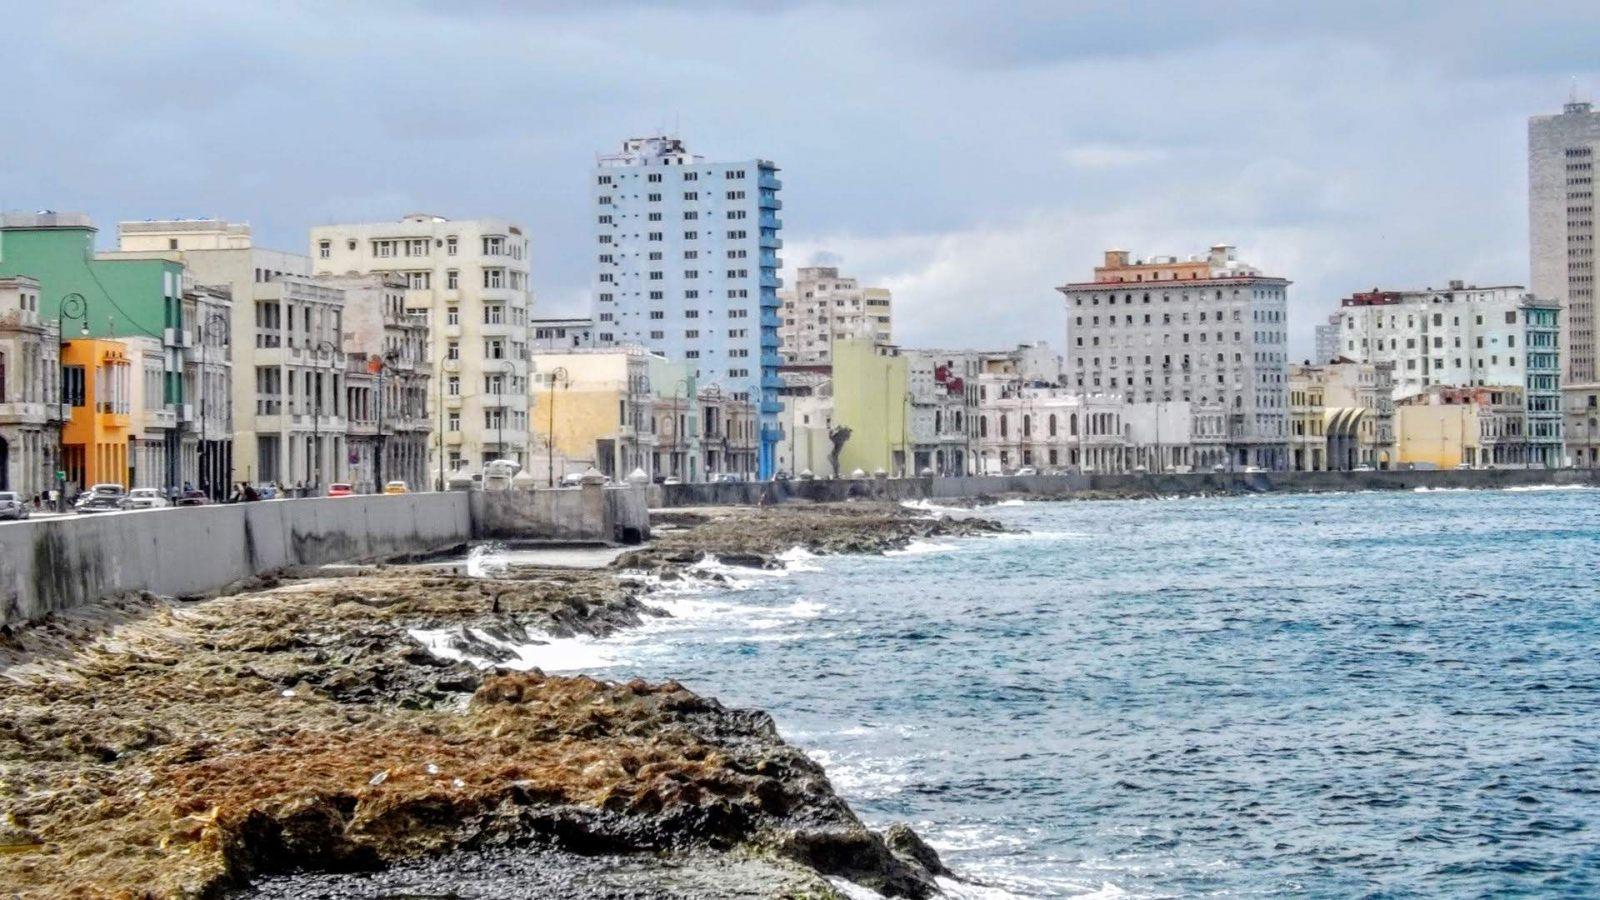 Hibiscus & Nomada : - - Malecón La Habana